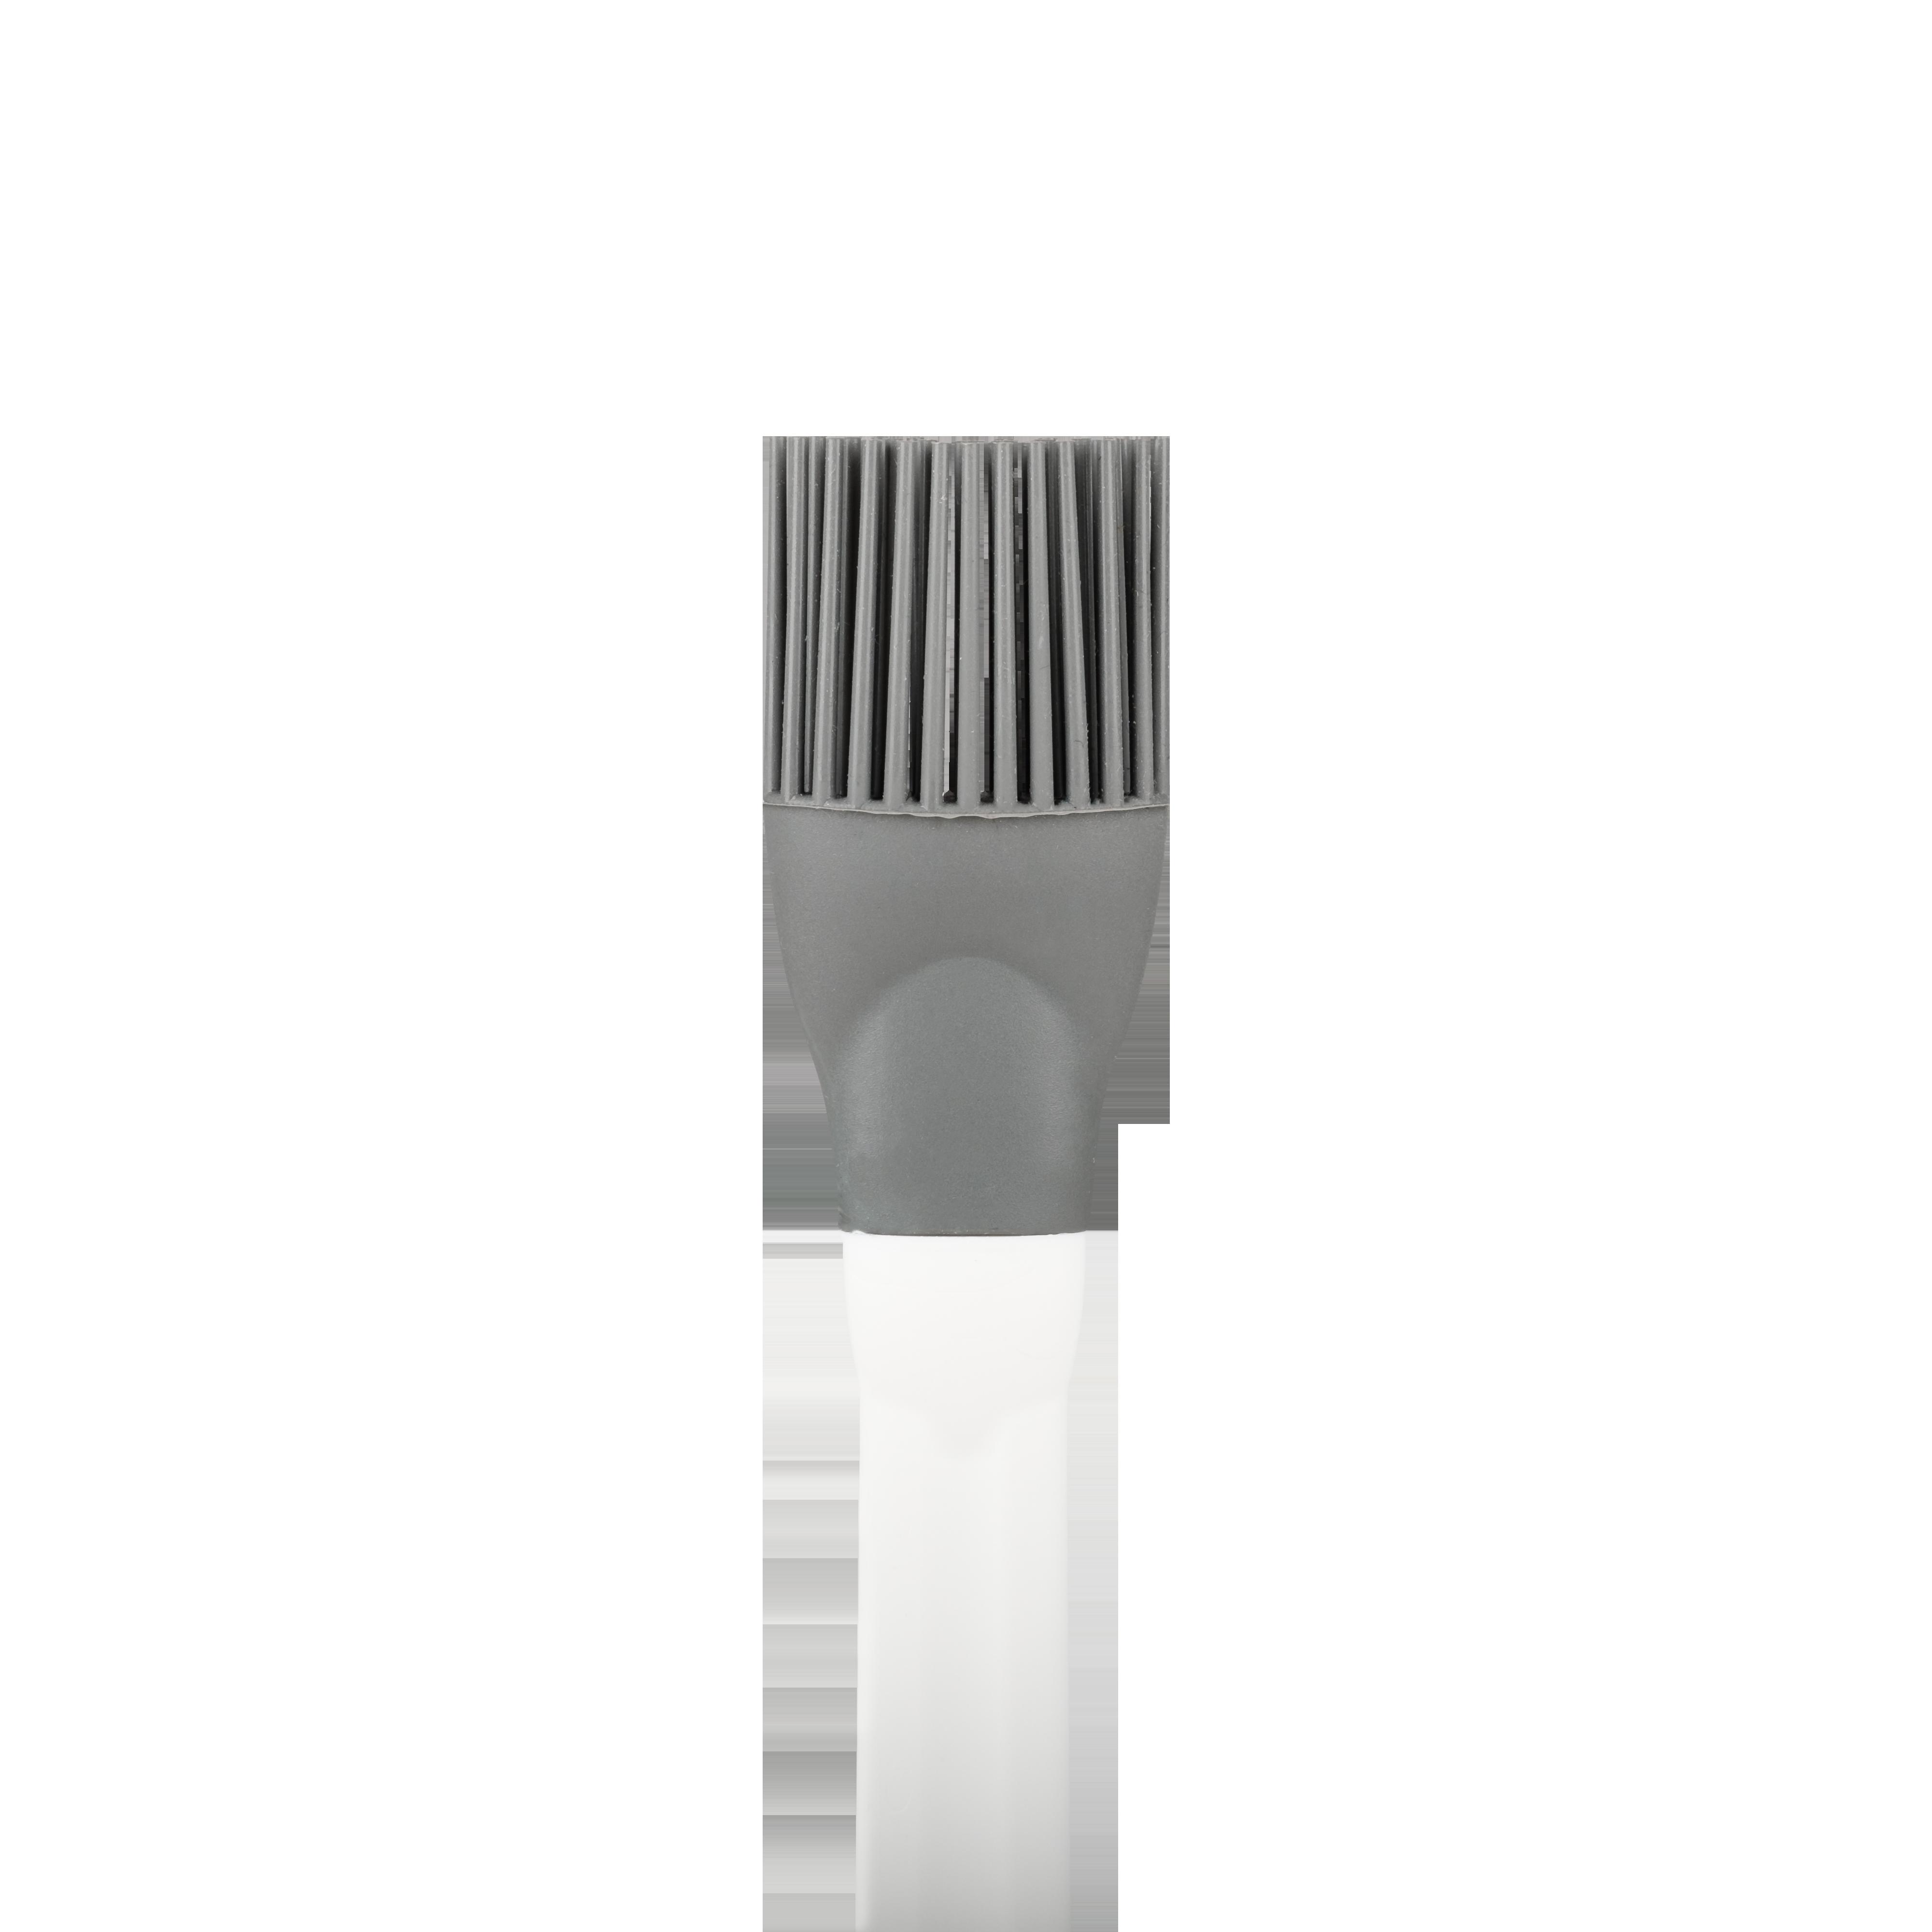 Silikon Back – und Grillpinsel 50 mm